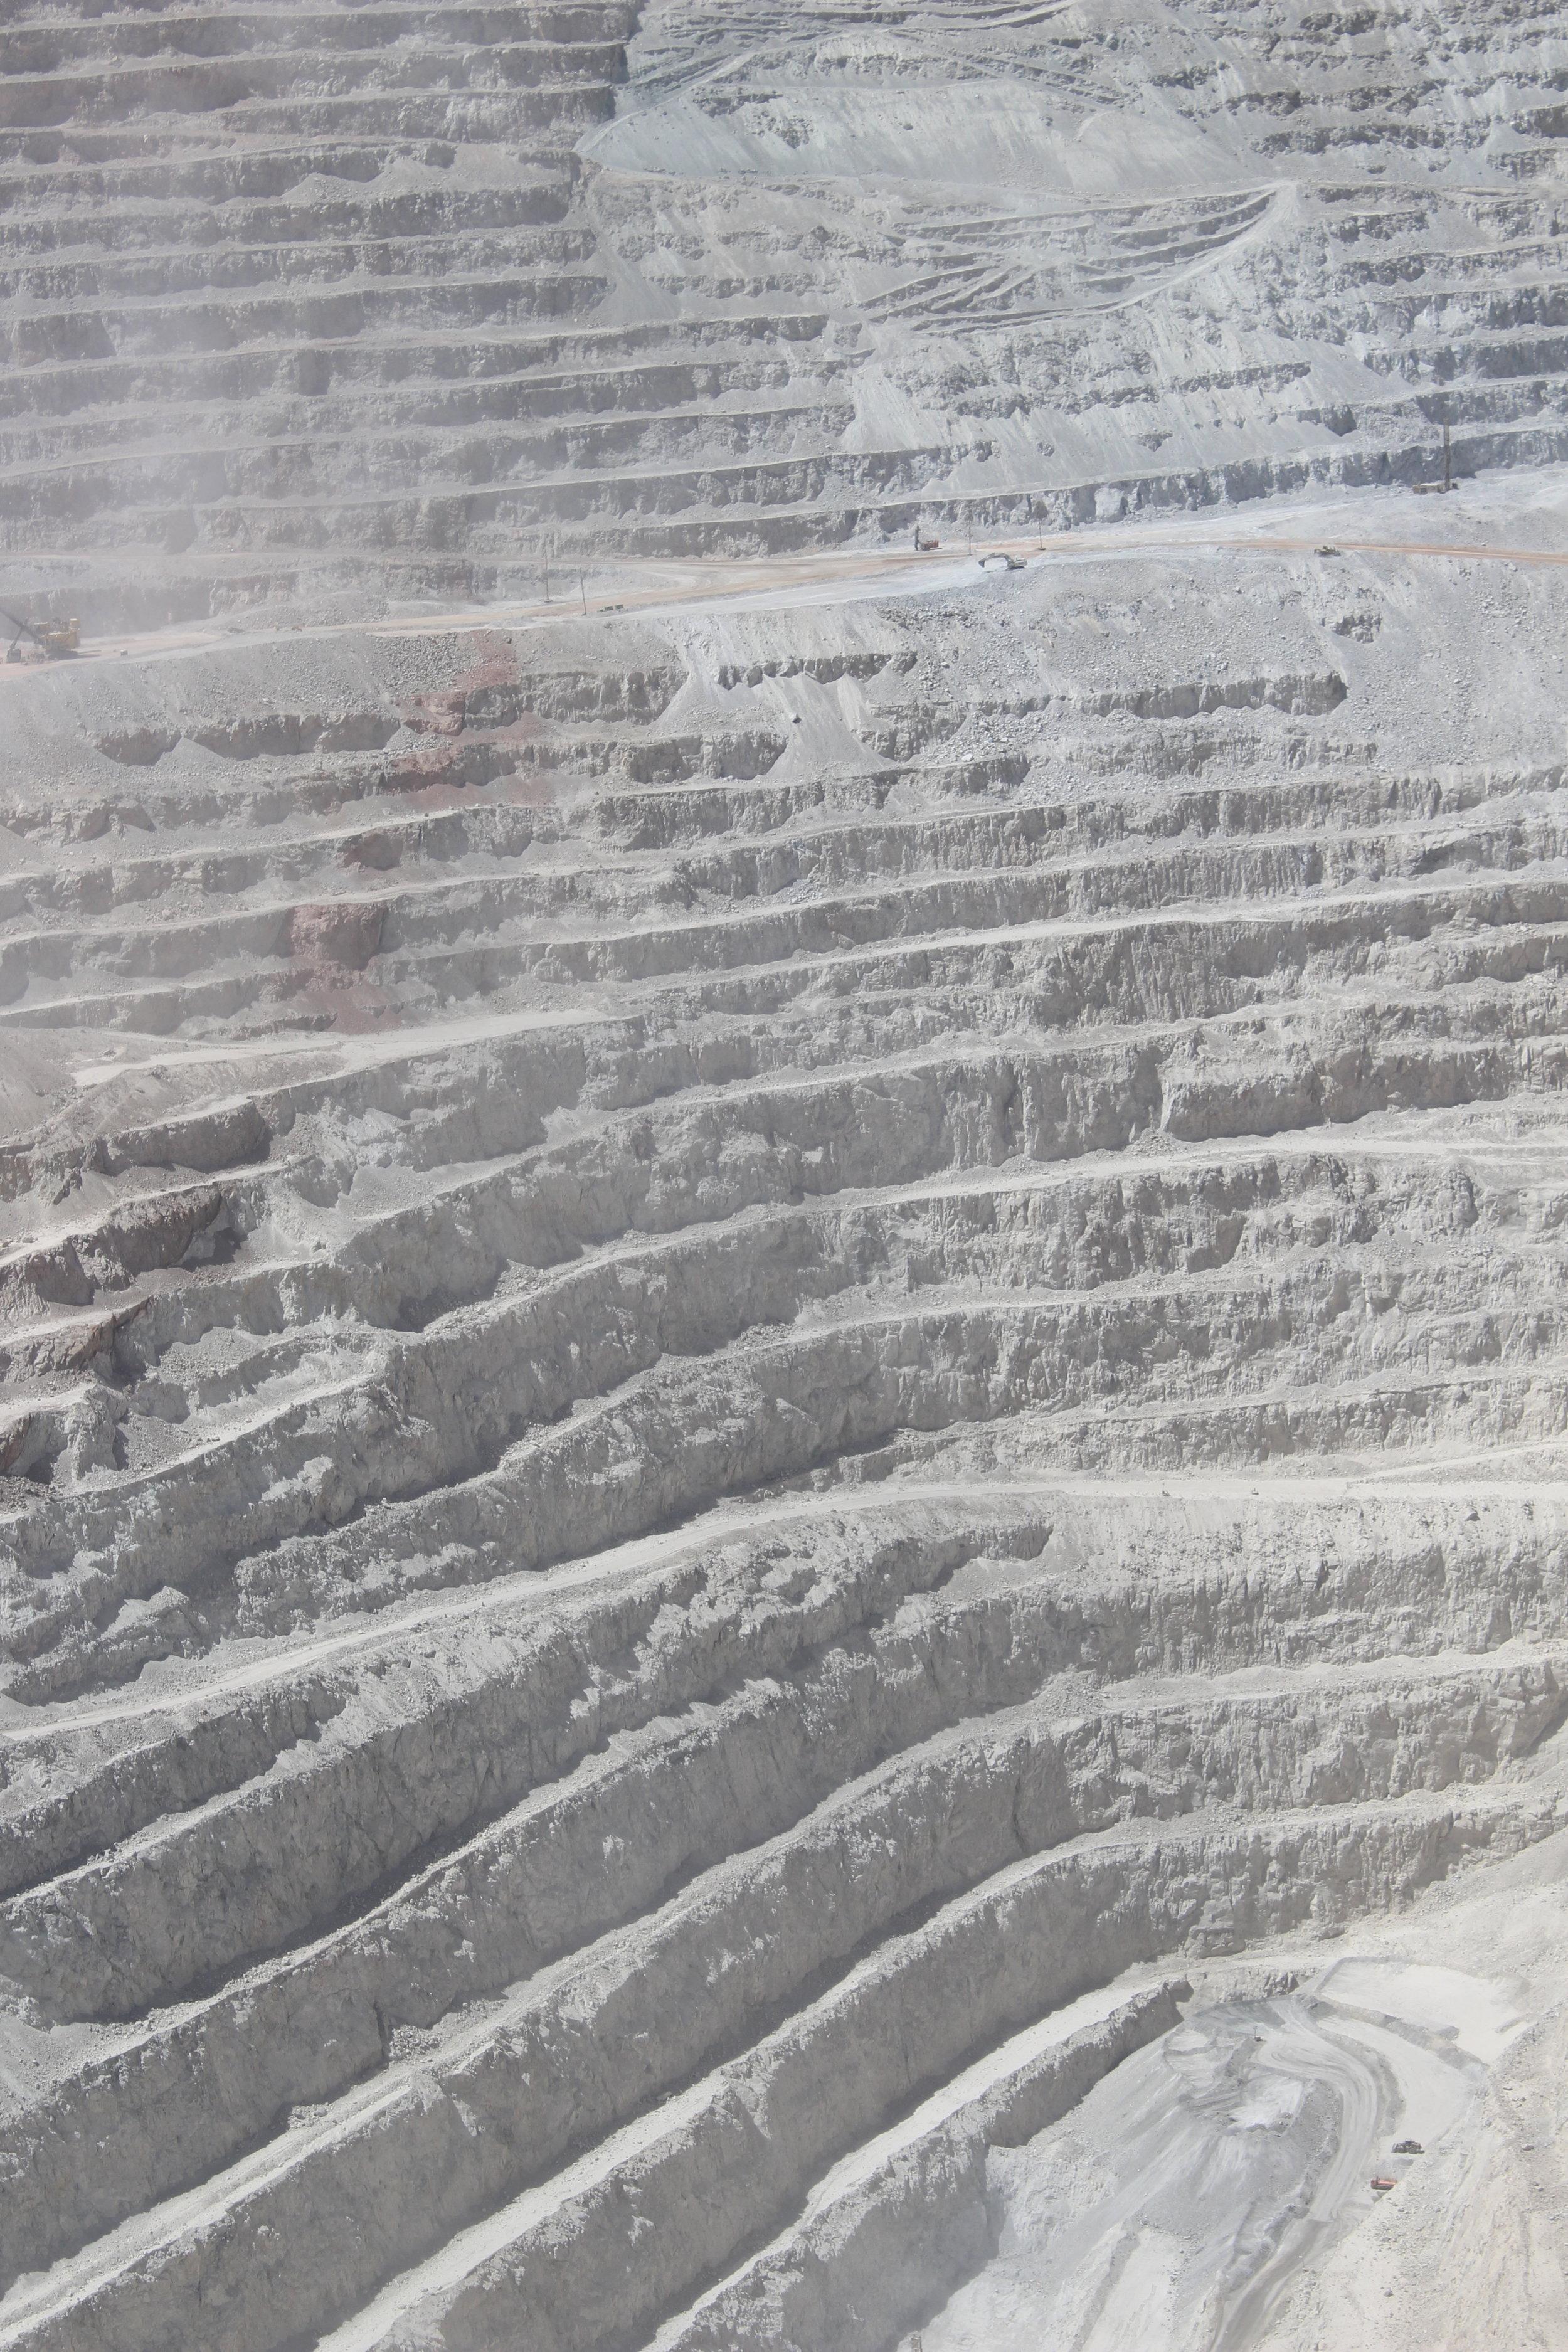 Chuquicamata copper mine located in the Atacama Desert,  Hannah Rowan.